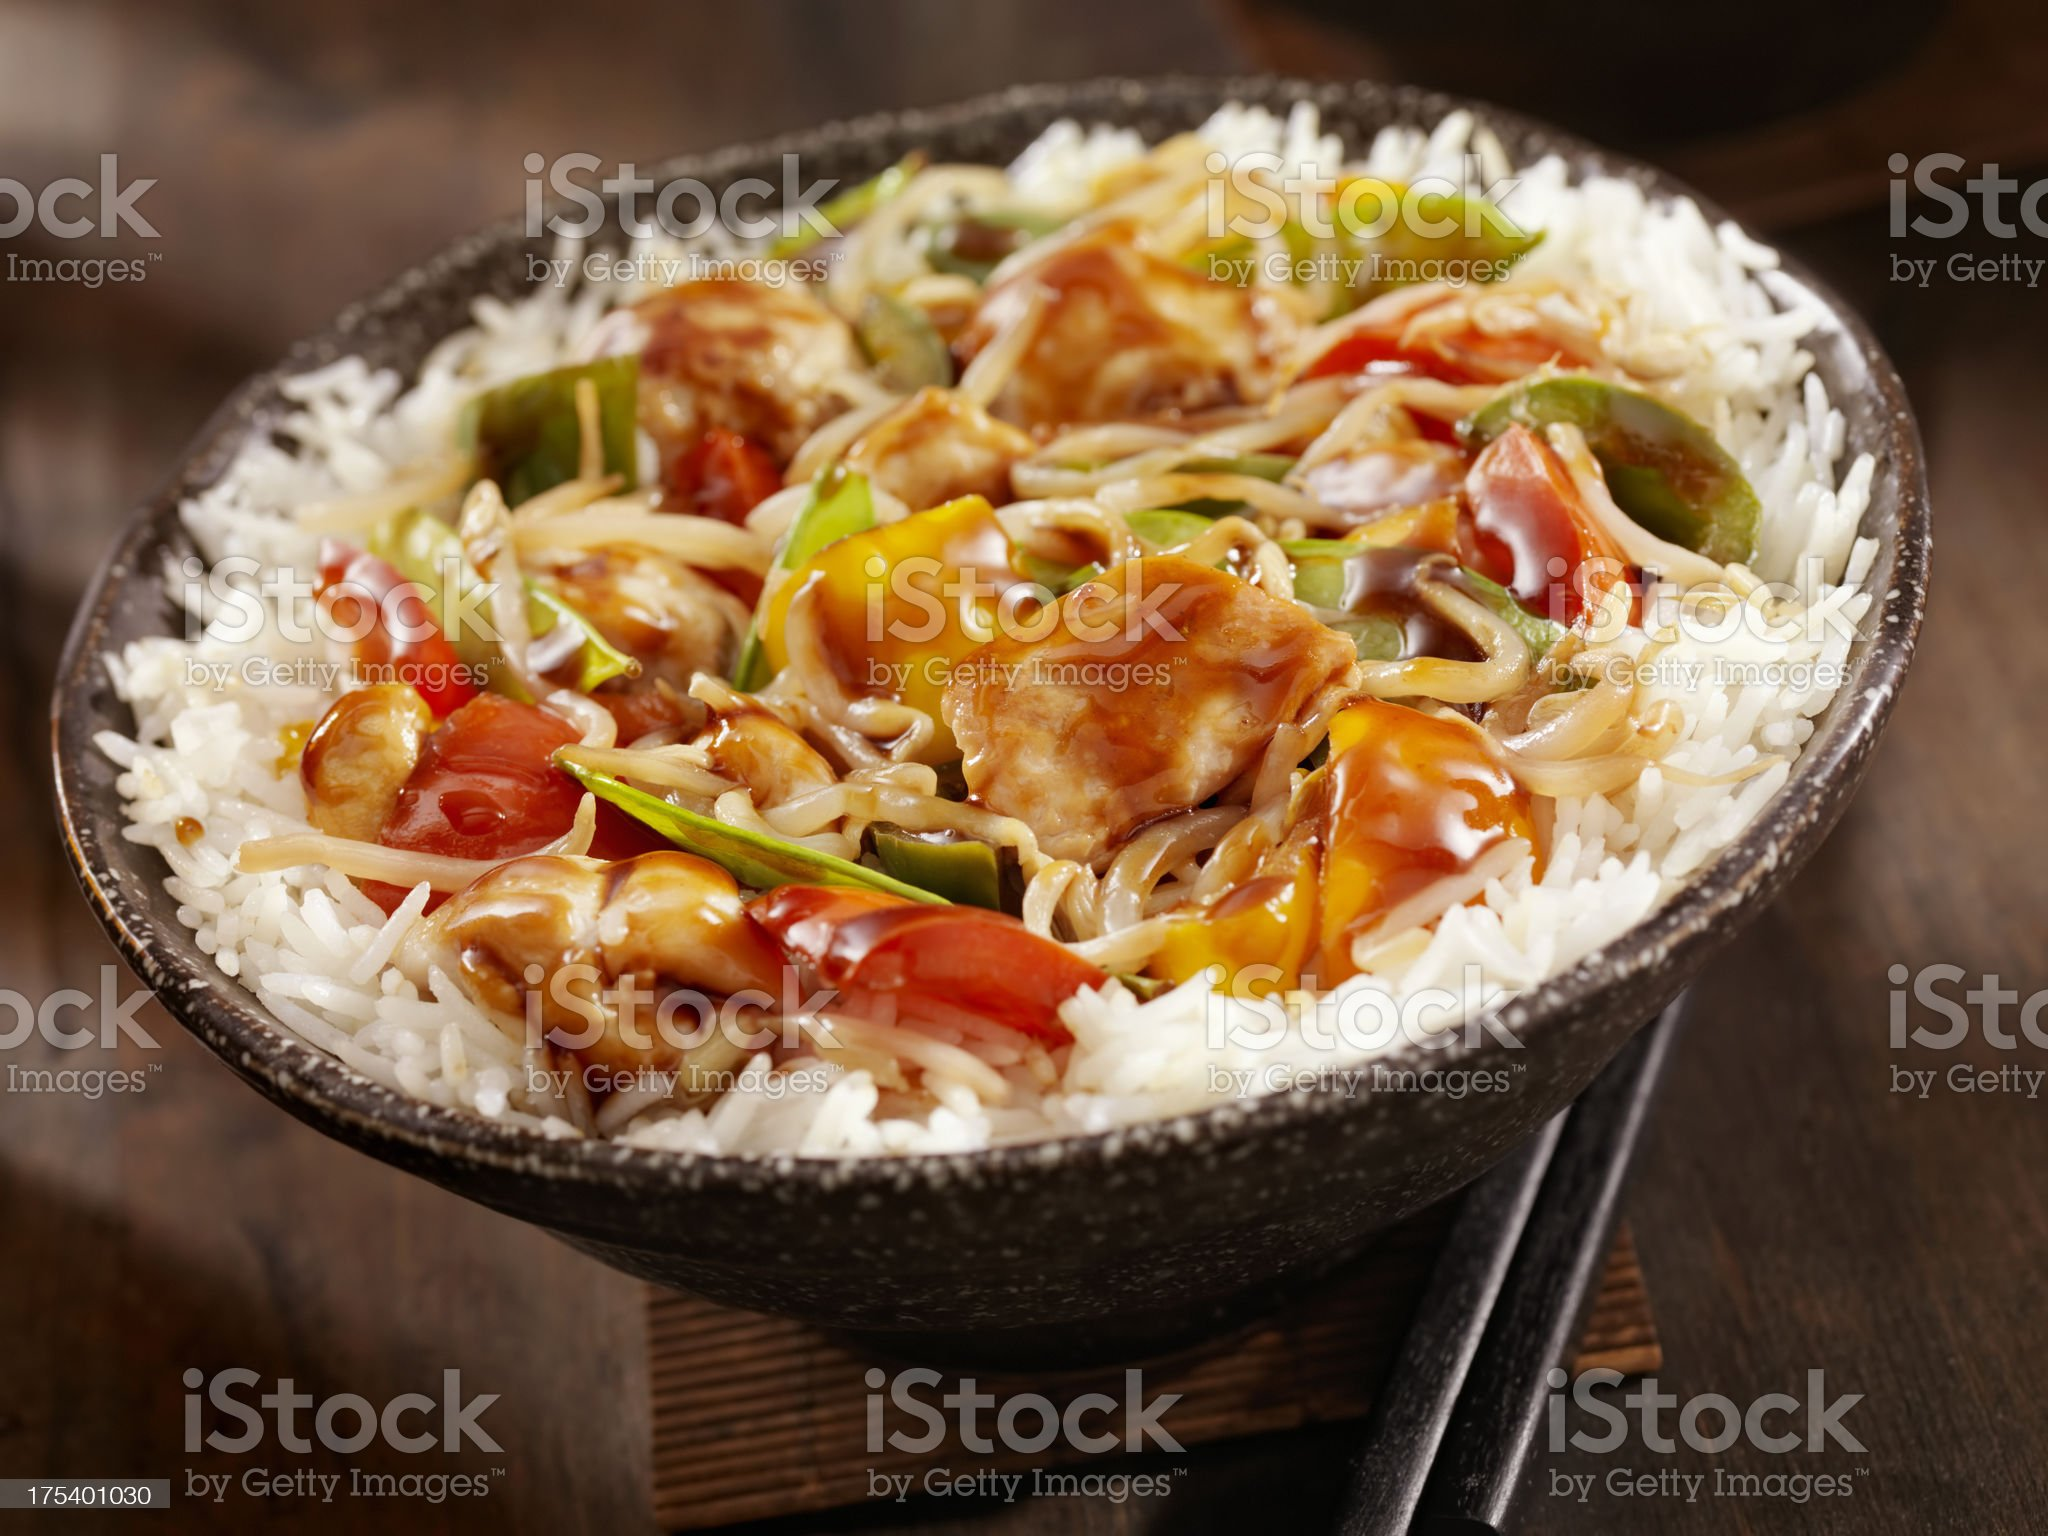 Teriyaki Chicken Stir fry royalty-free stock photo